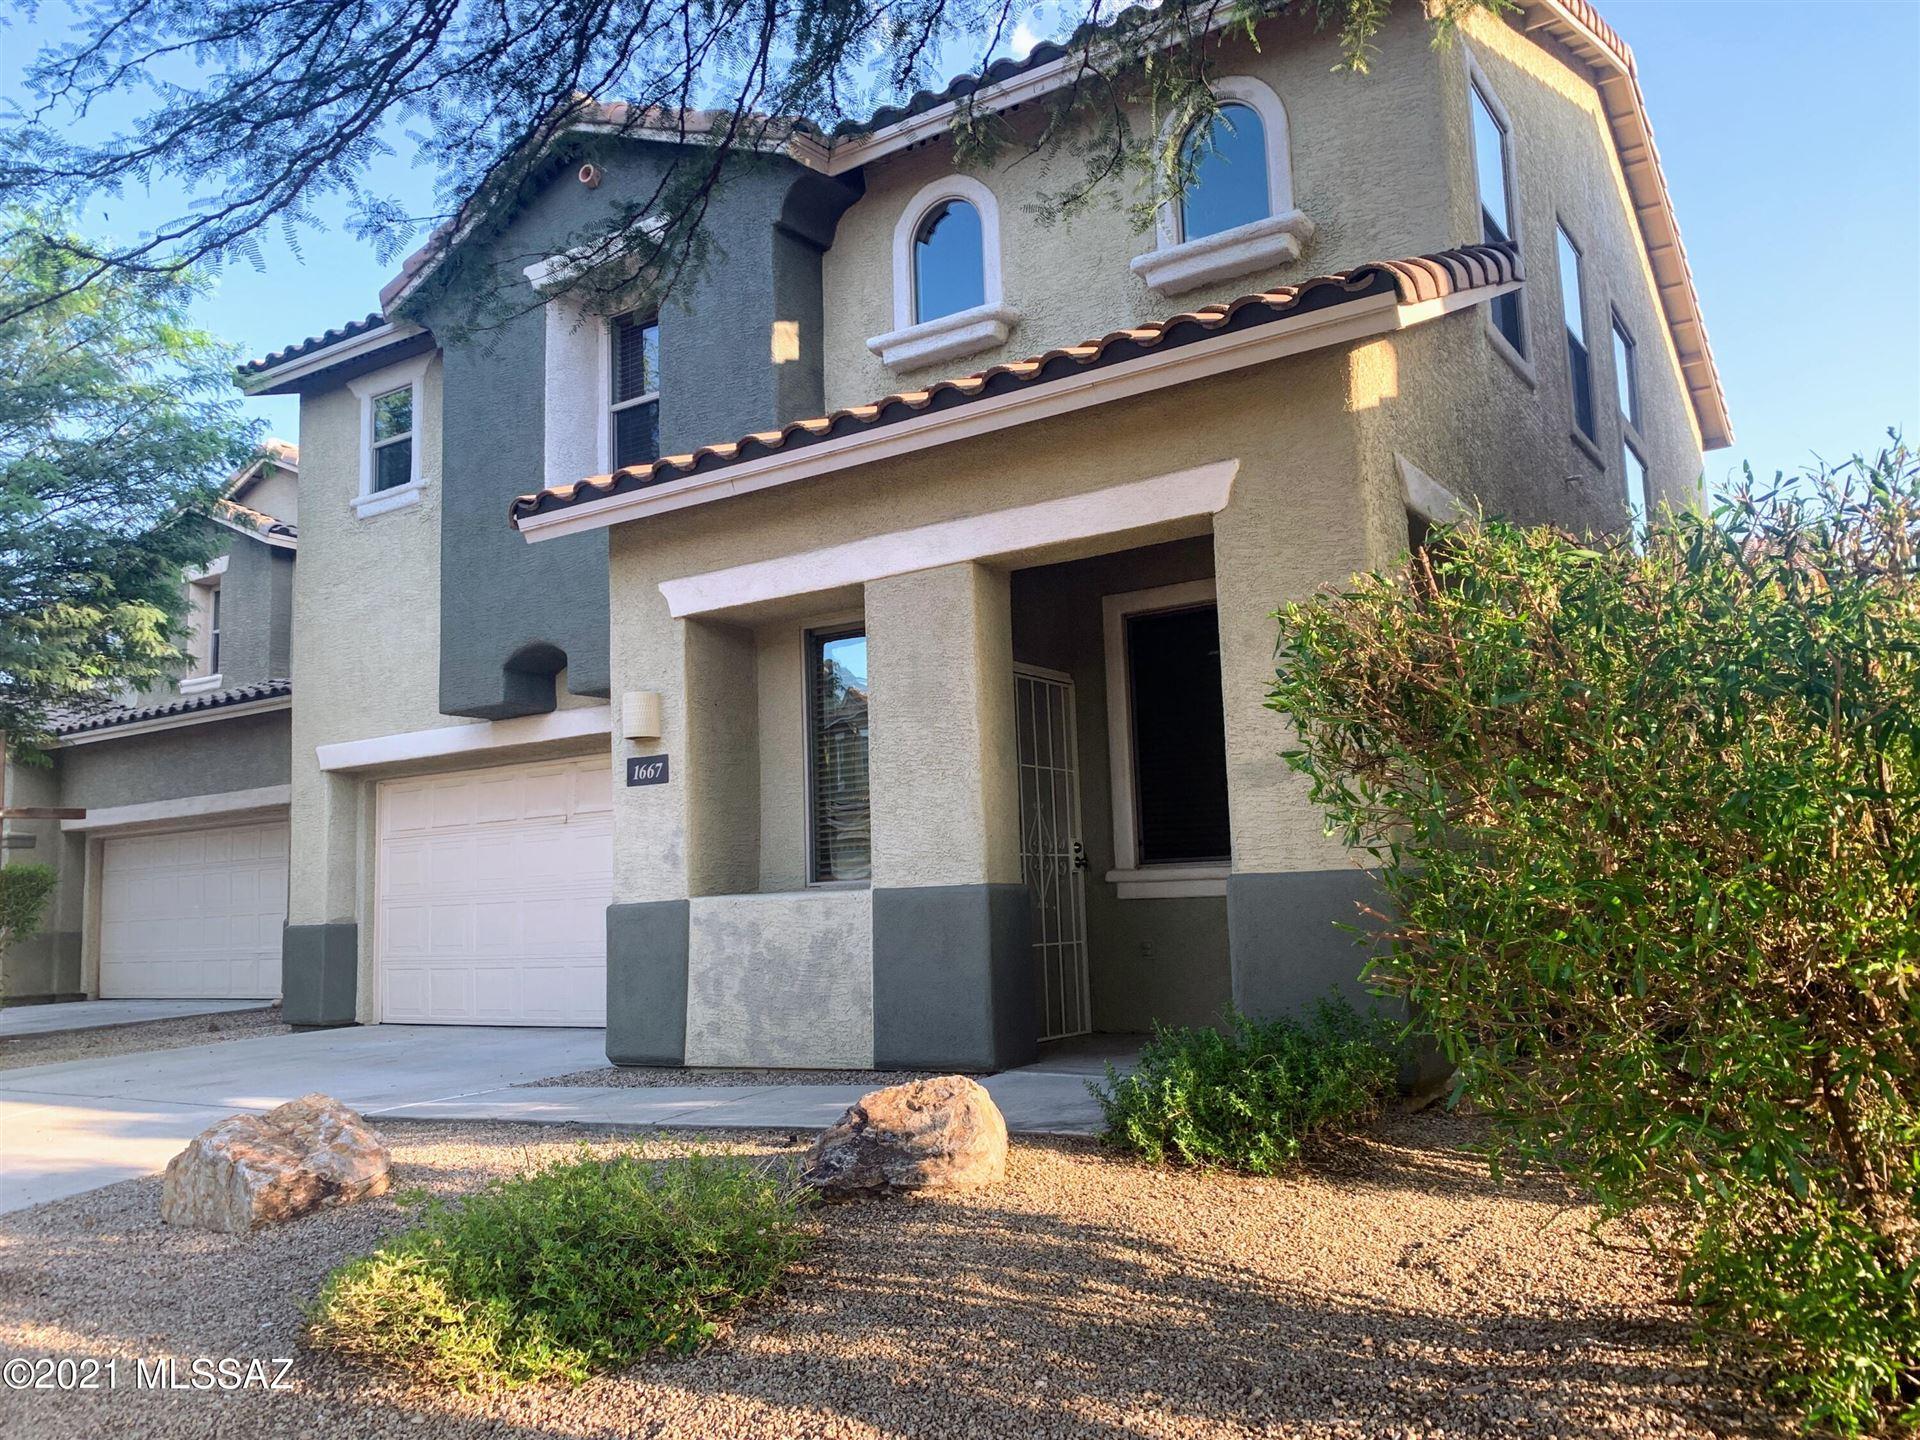 1667 W Blue Horizon Street, Tucson, AZ 85704 - MLS#: 22123336